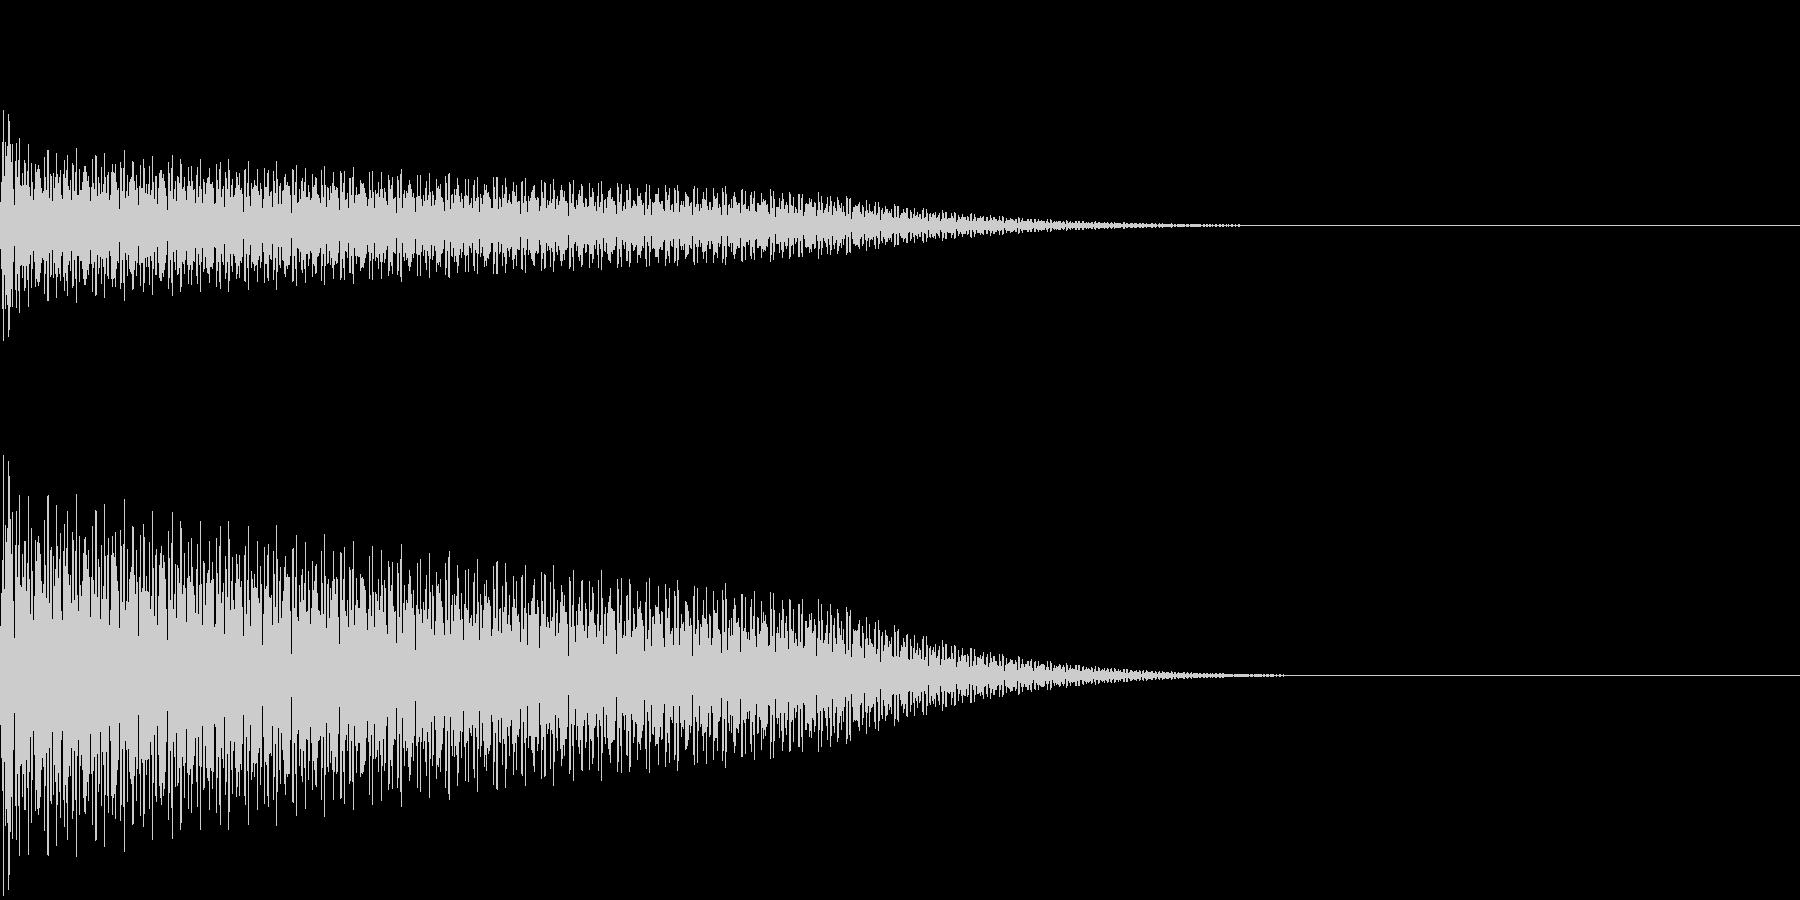 【SE 効果音】奇妙な音の未再生の波形